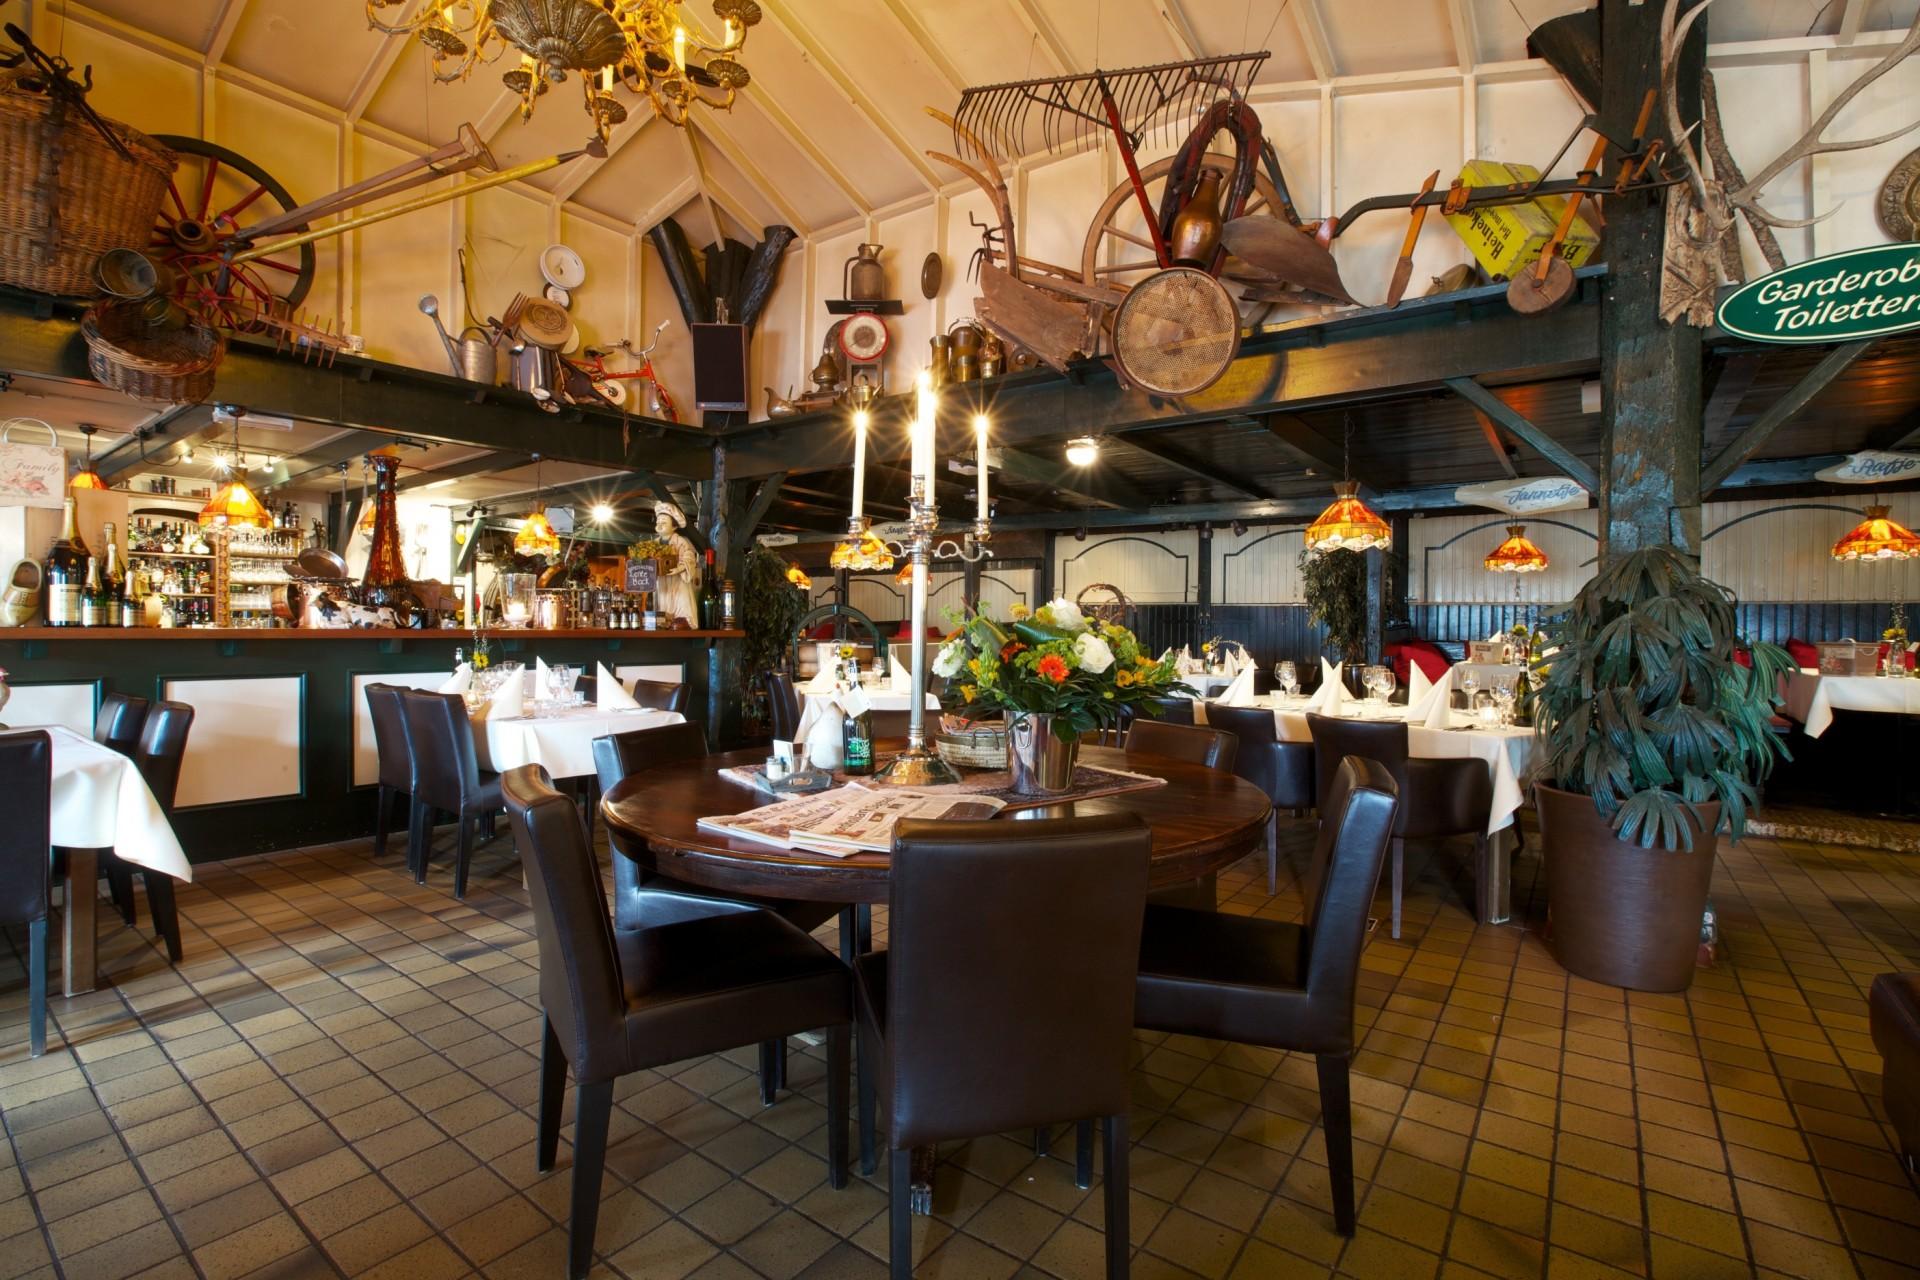 Nadorst-restaurant-uitspanning-faciliteiten-zalen-oude-boerderij-1